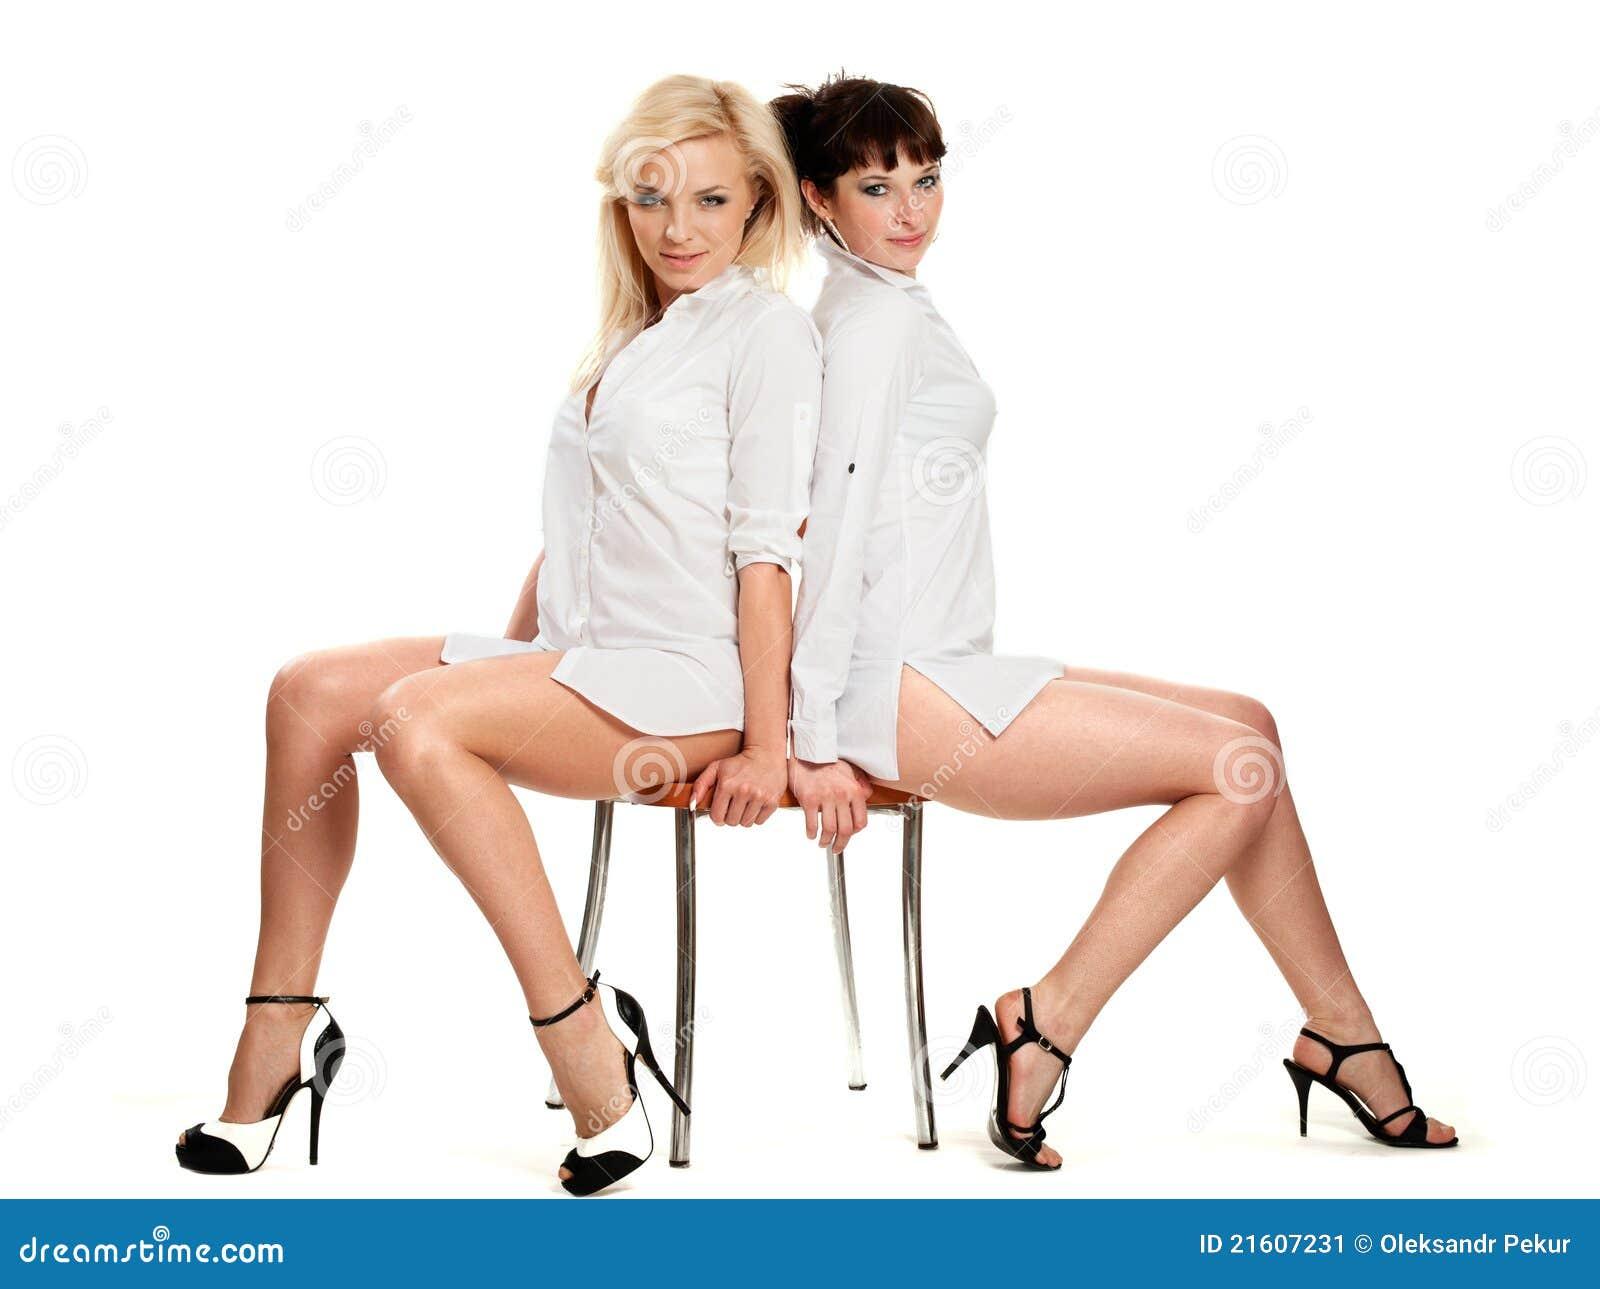 2 girls on 1 guy one girl is a virgin 10